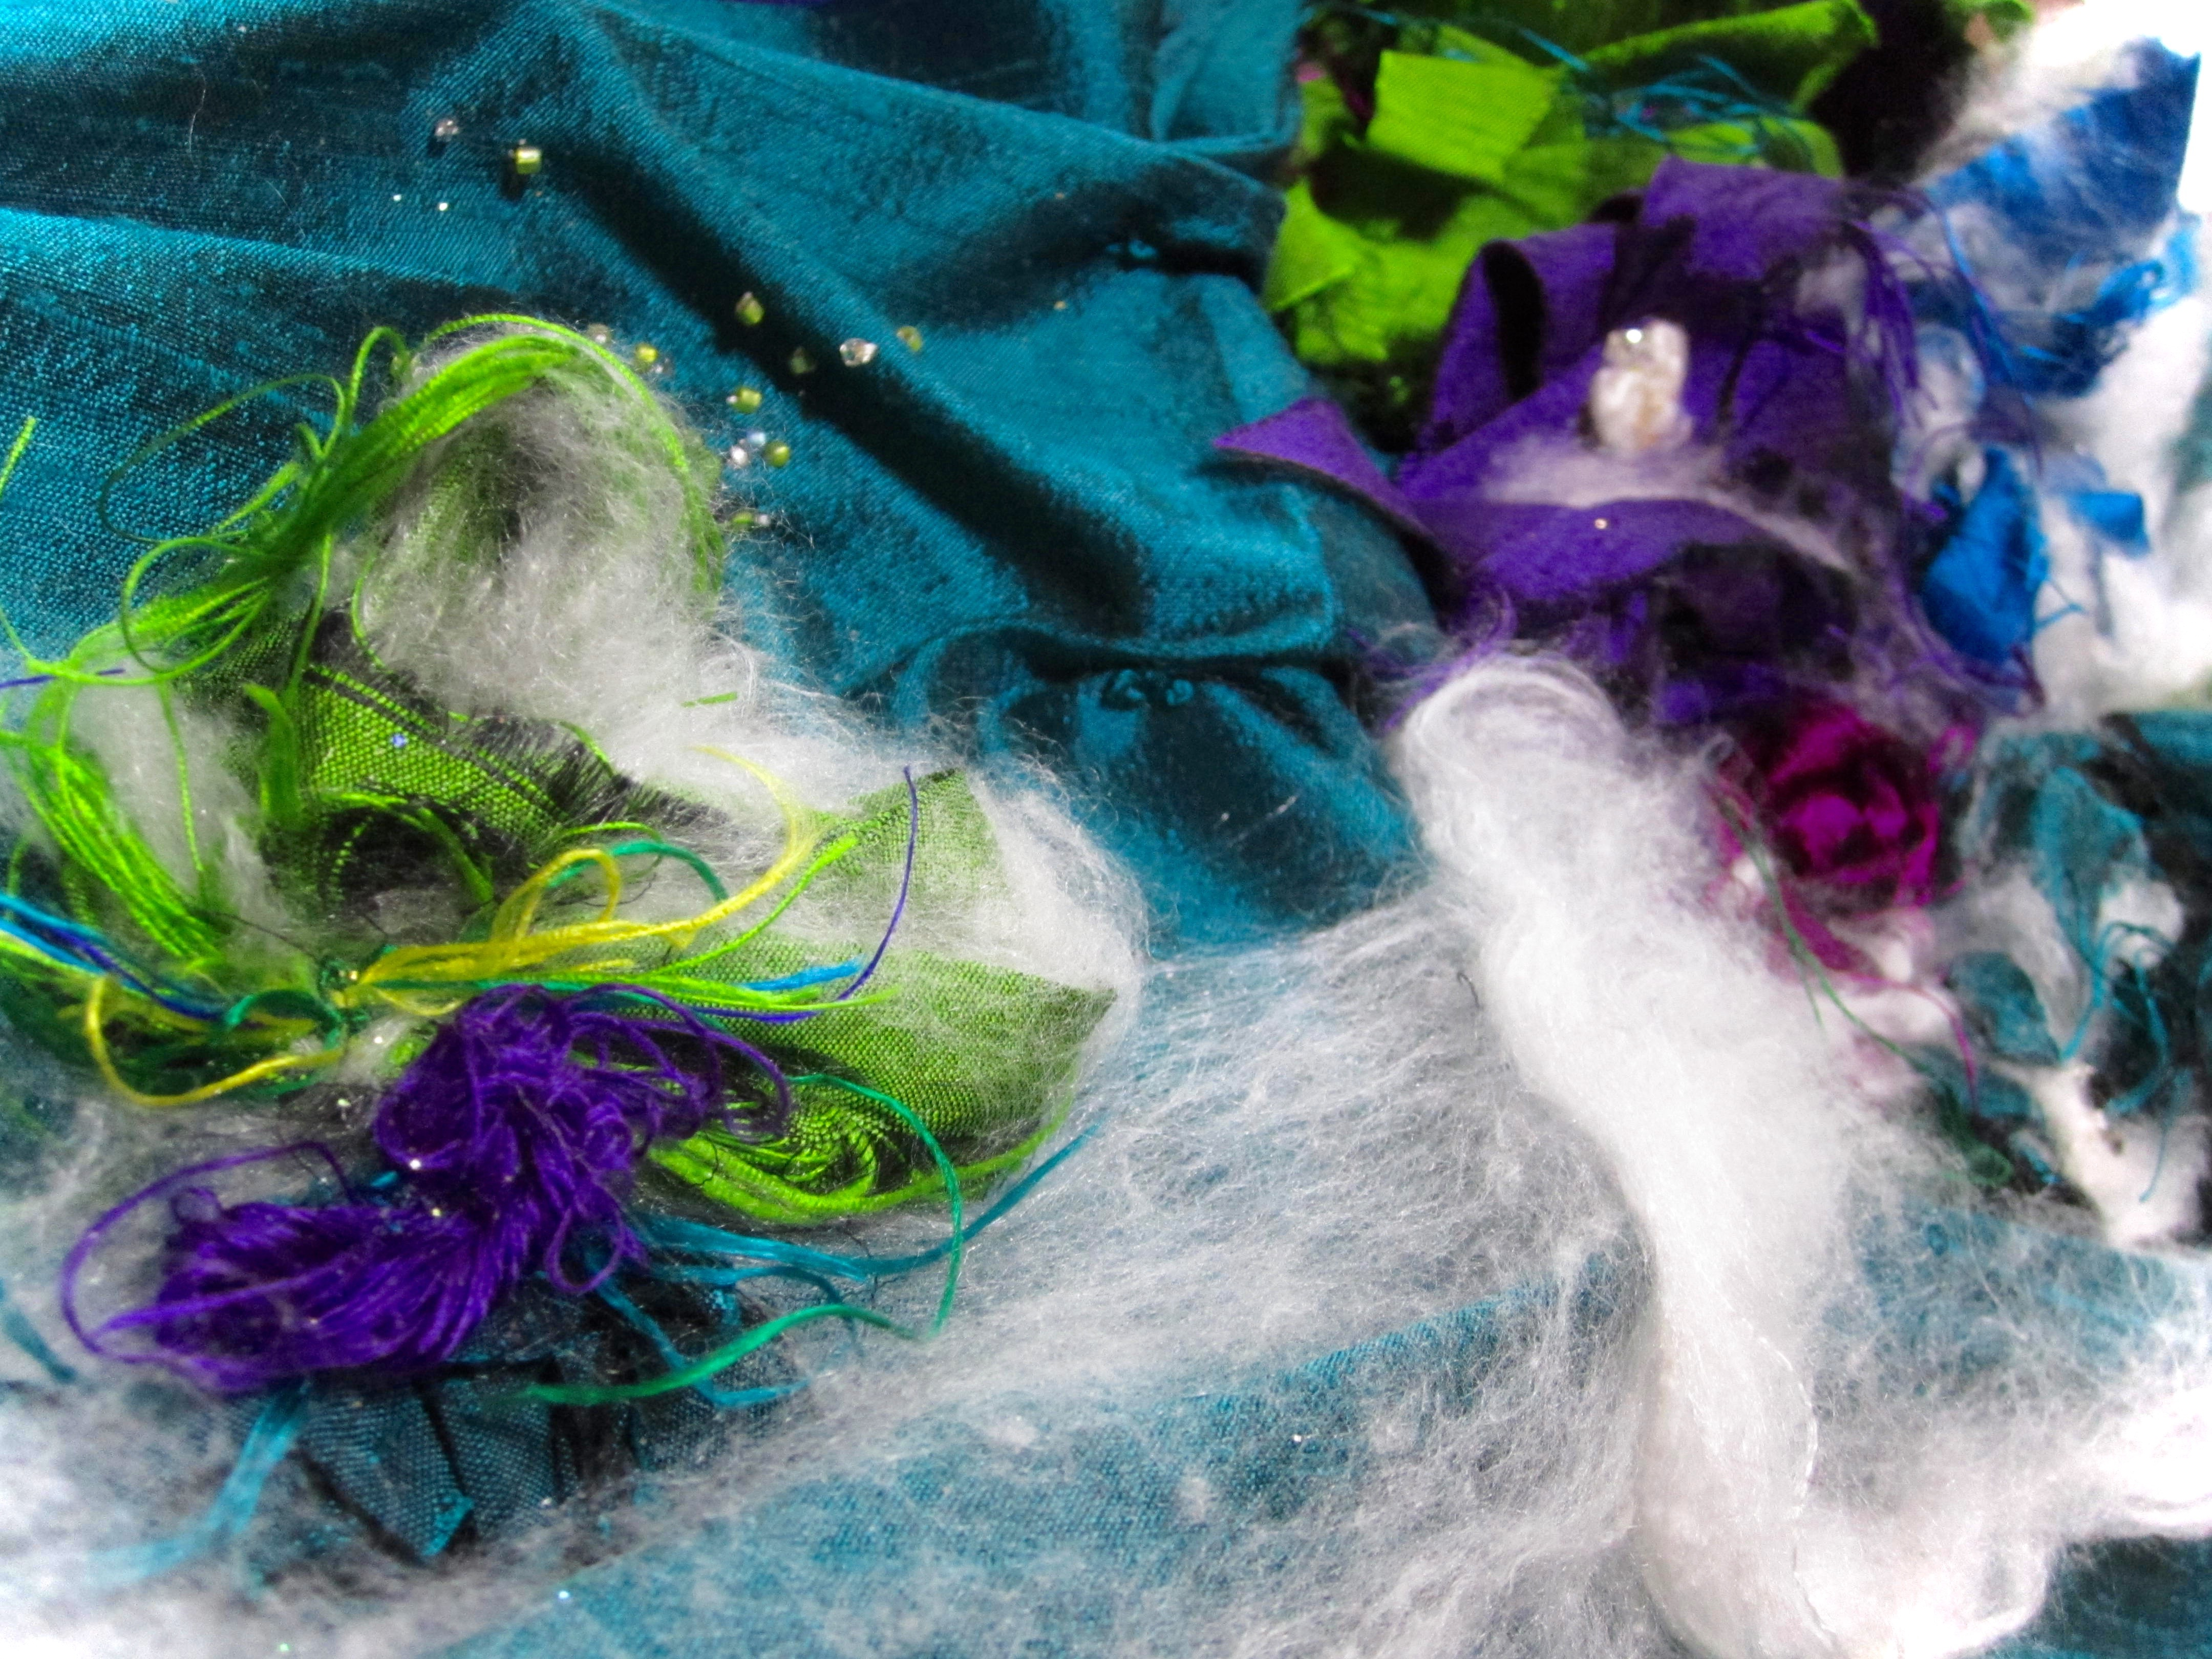 真綿と珊瑚